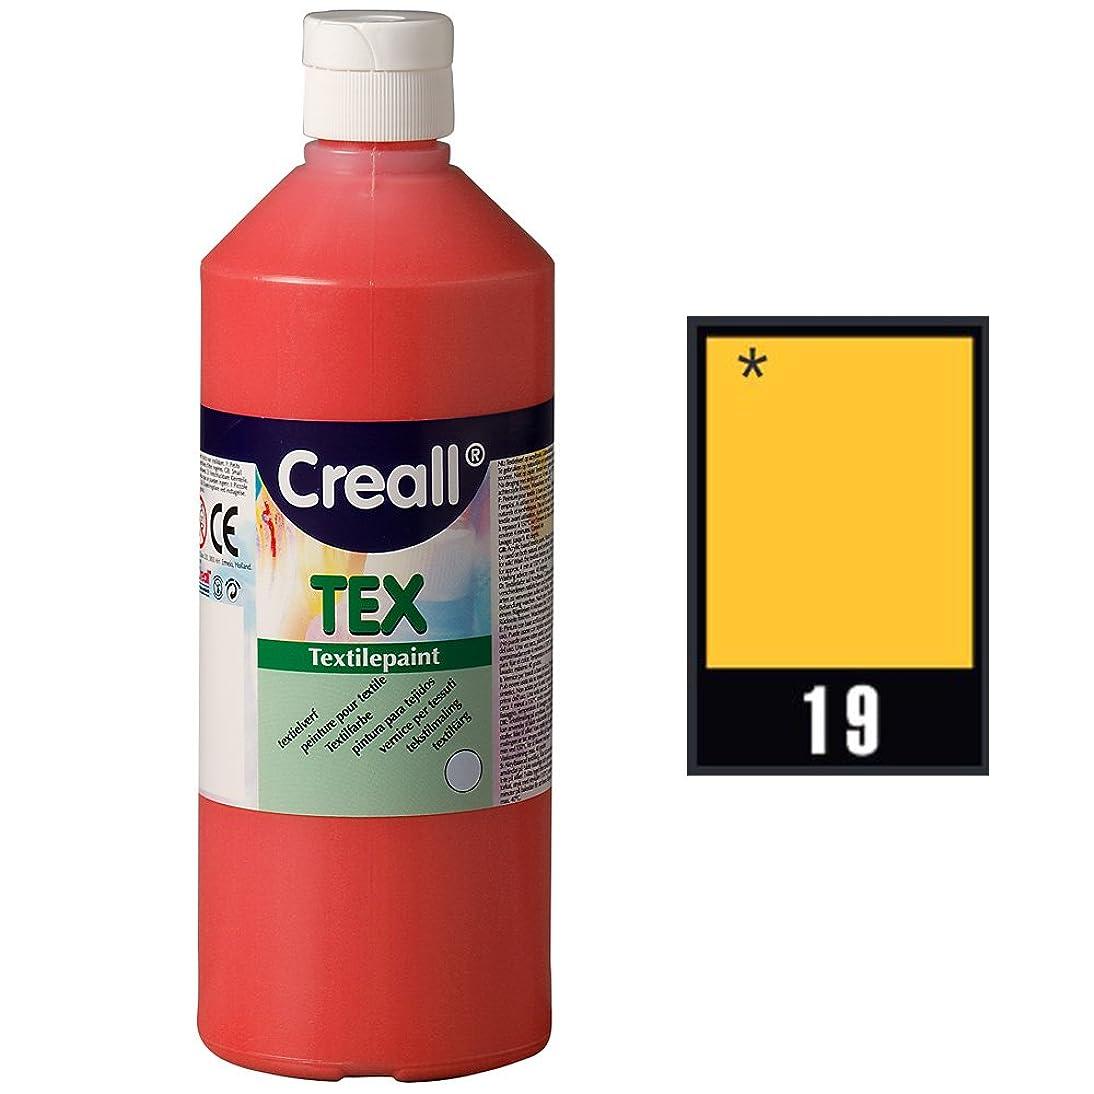 Creall Havo24039 250 ml 19 Gold Havo Textile Paint Bottle